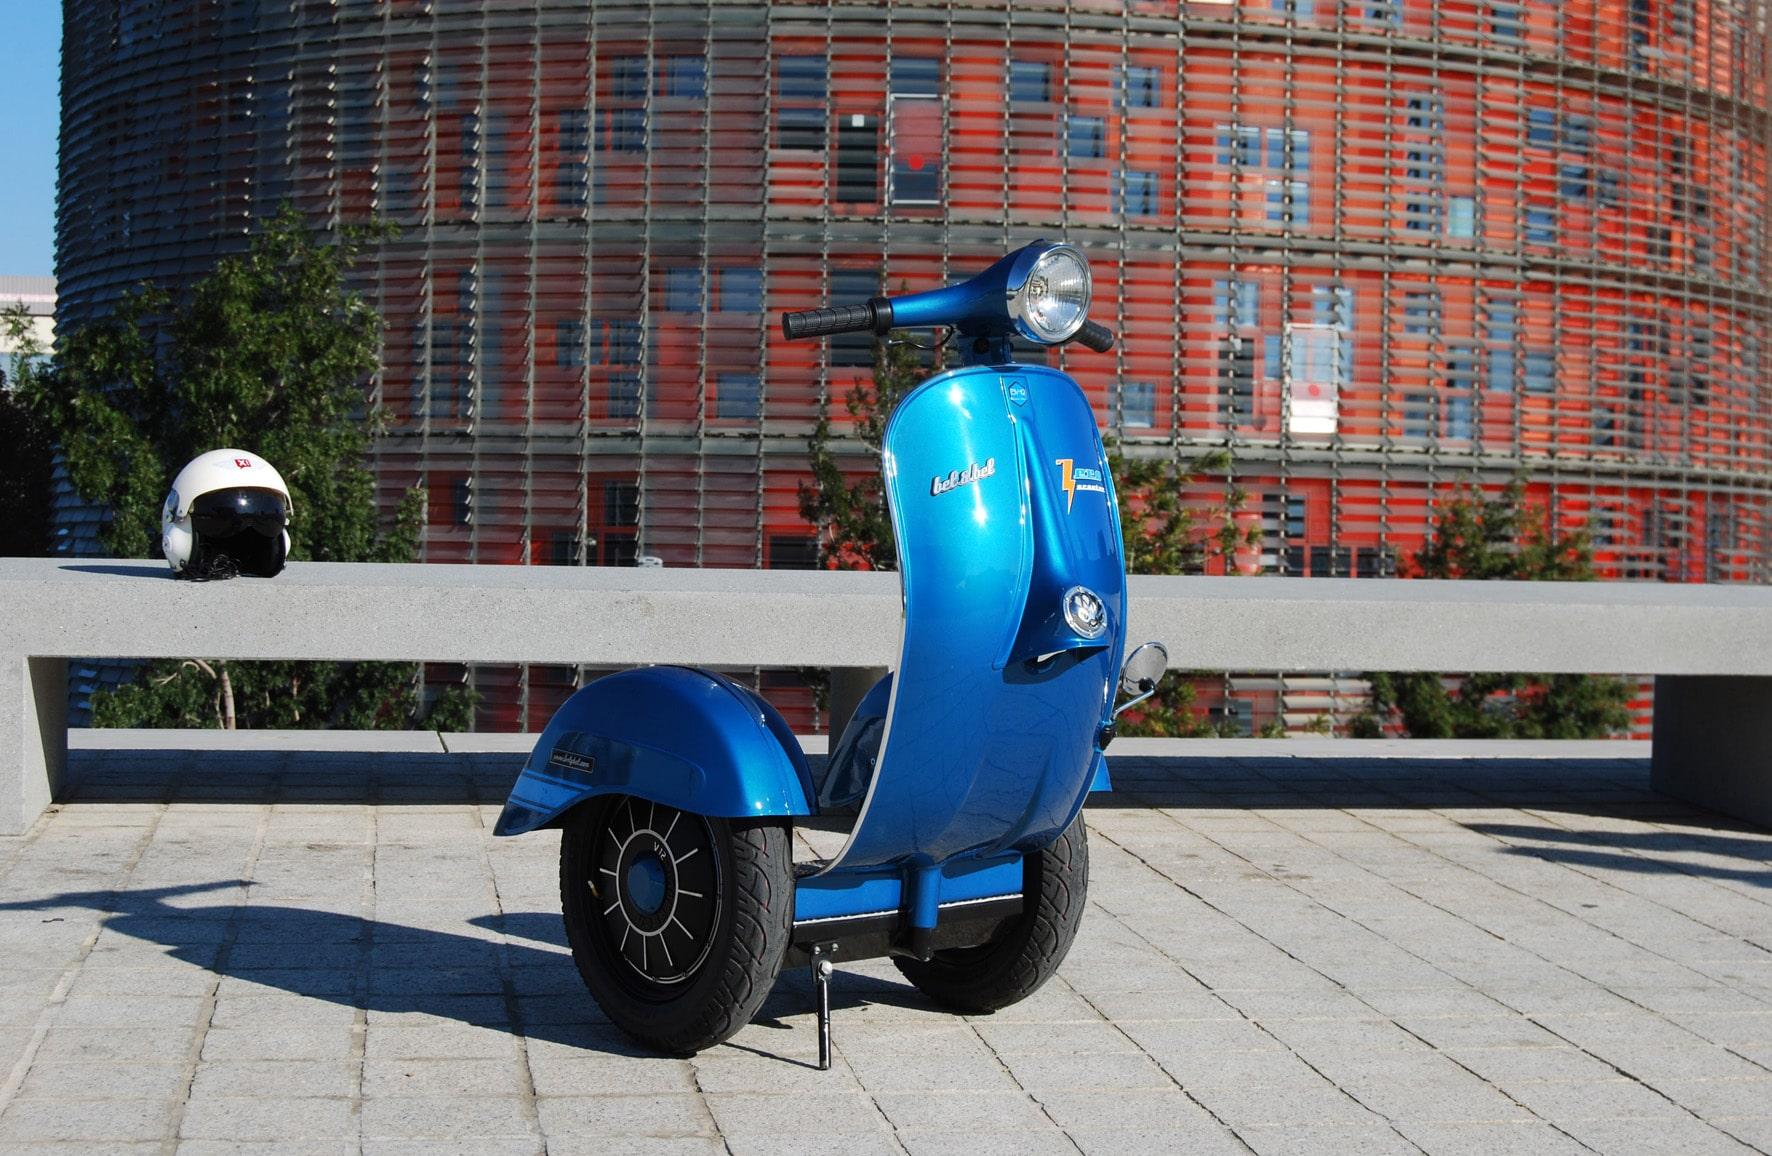 Innovation startup z ro scooter un v hicule hybrique - Isolation gratuite gouvernement ...